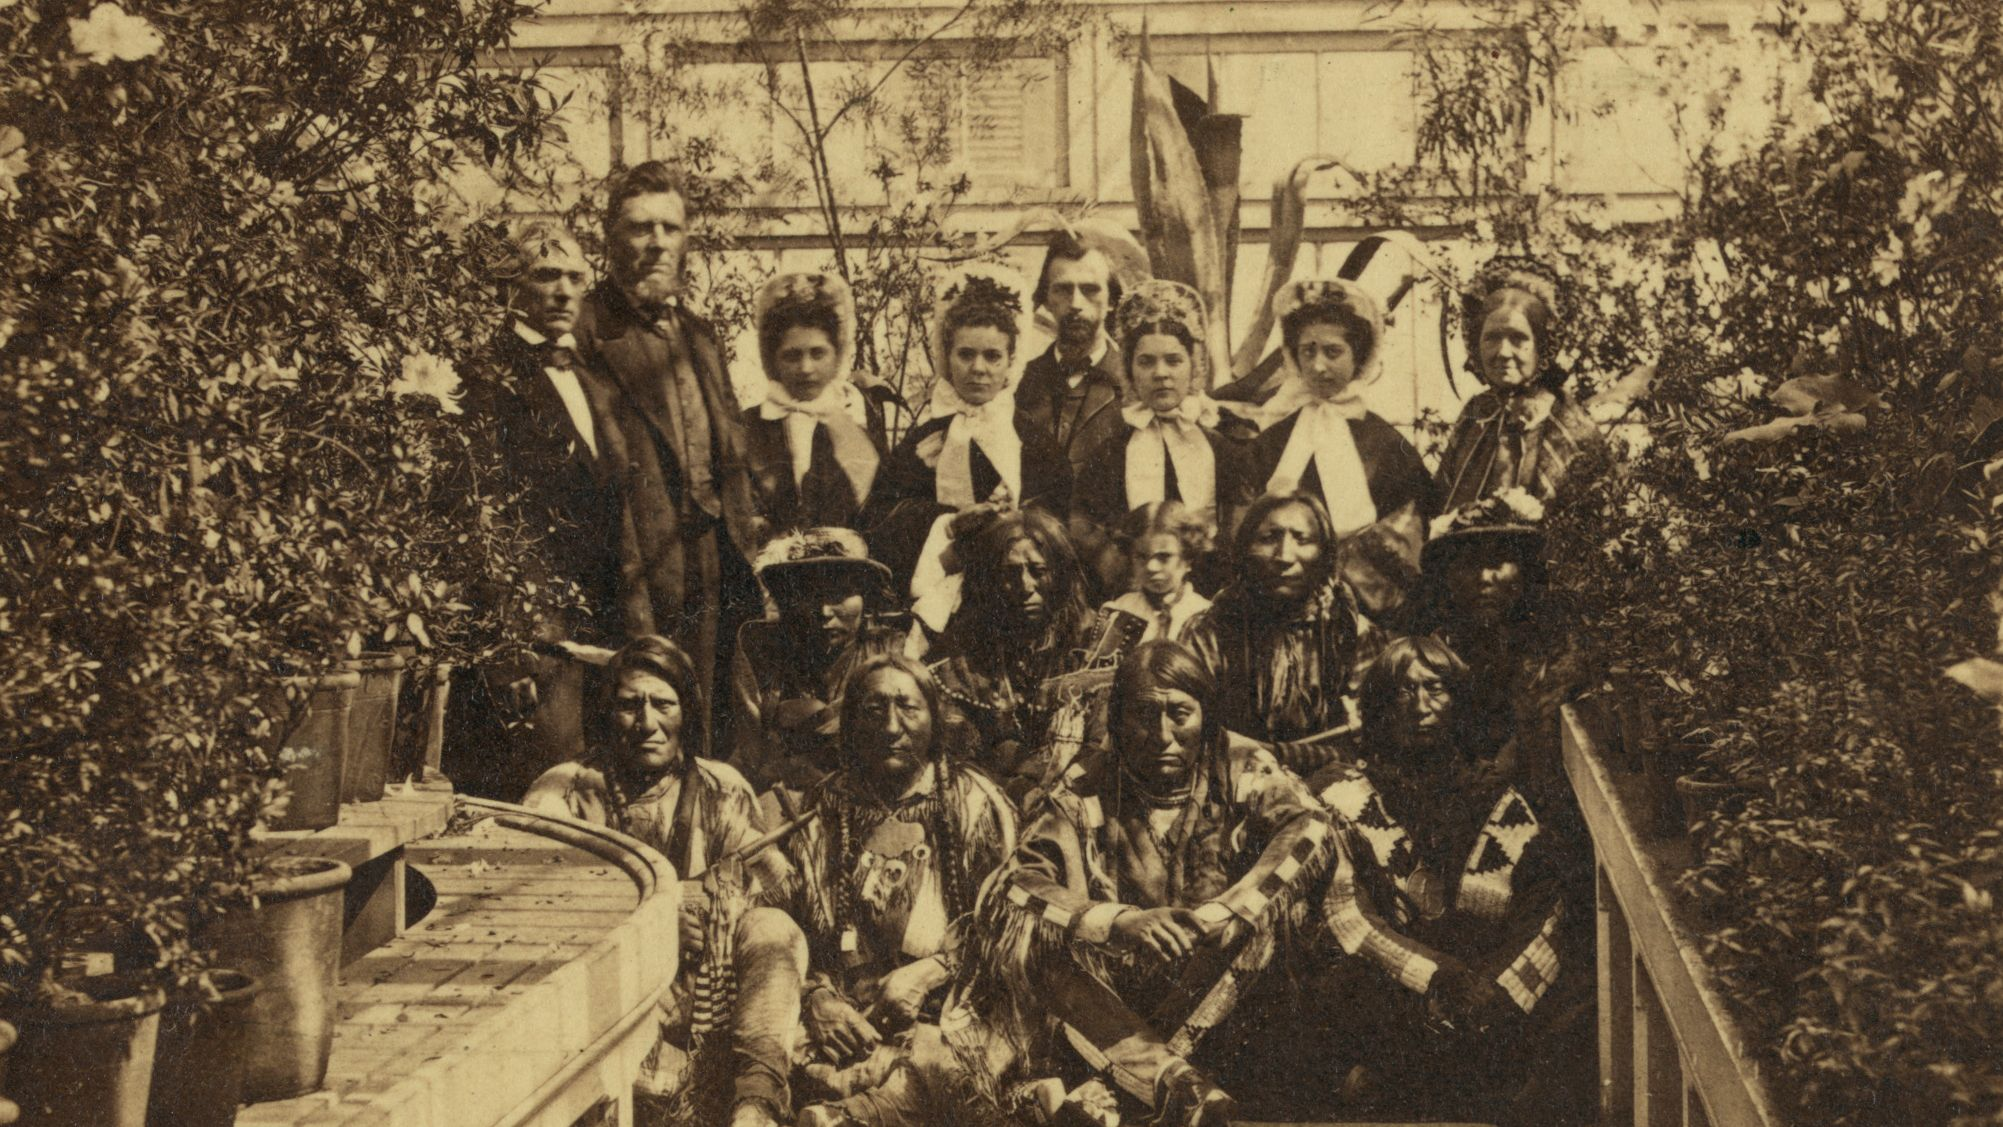 1864 Sand Creek Massacre: History and Impact